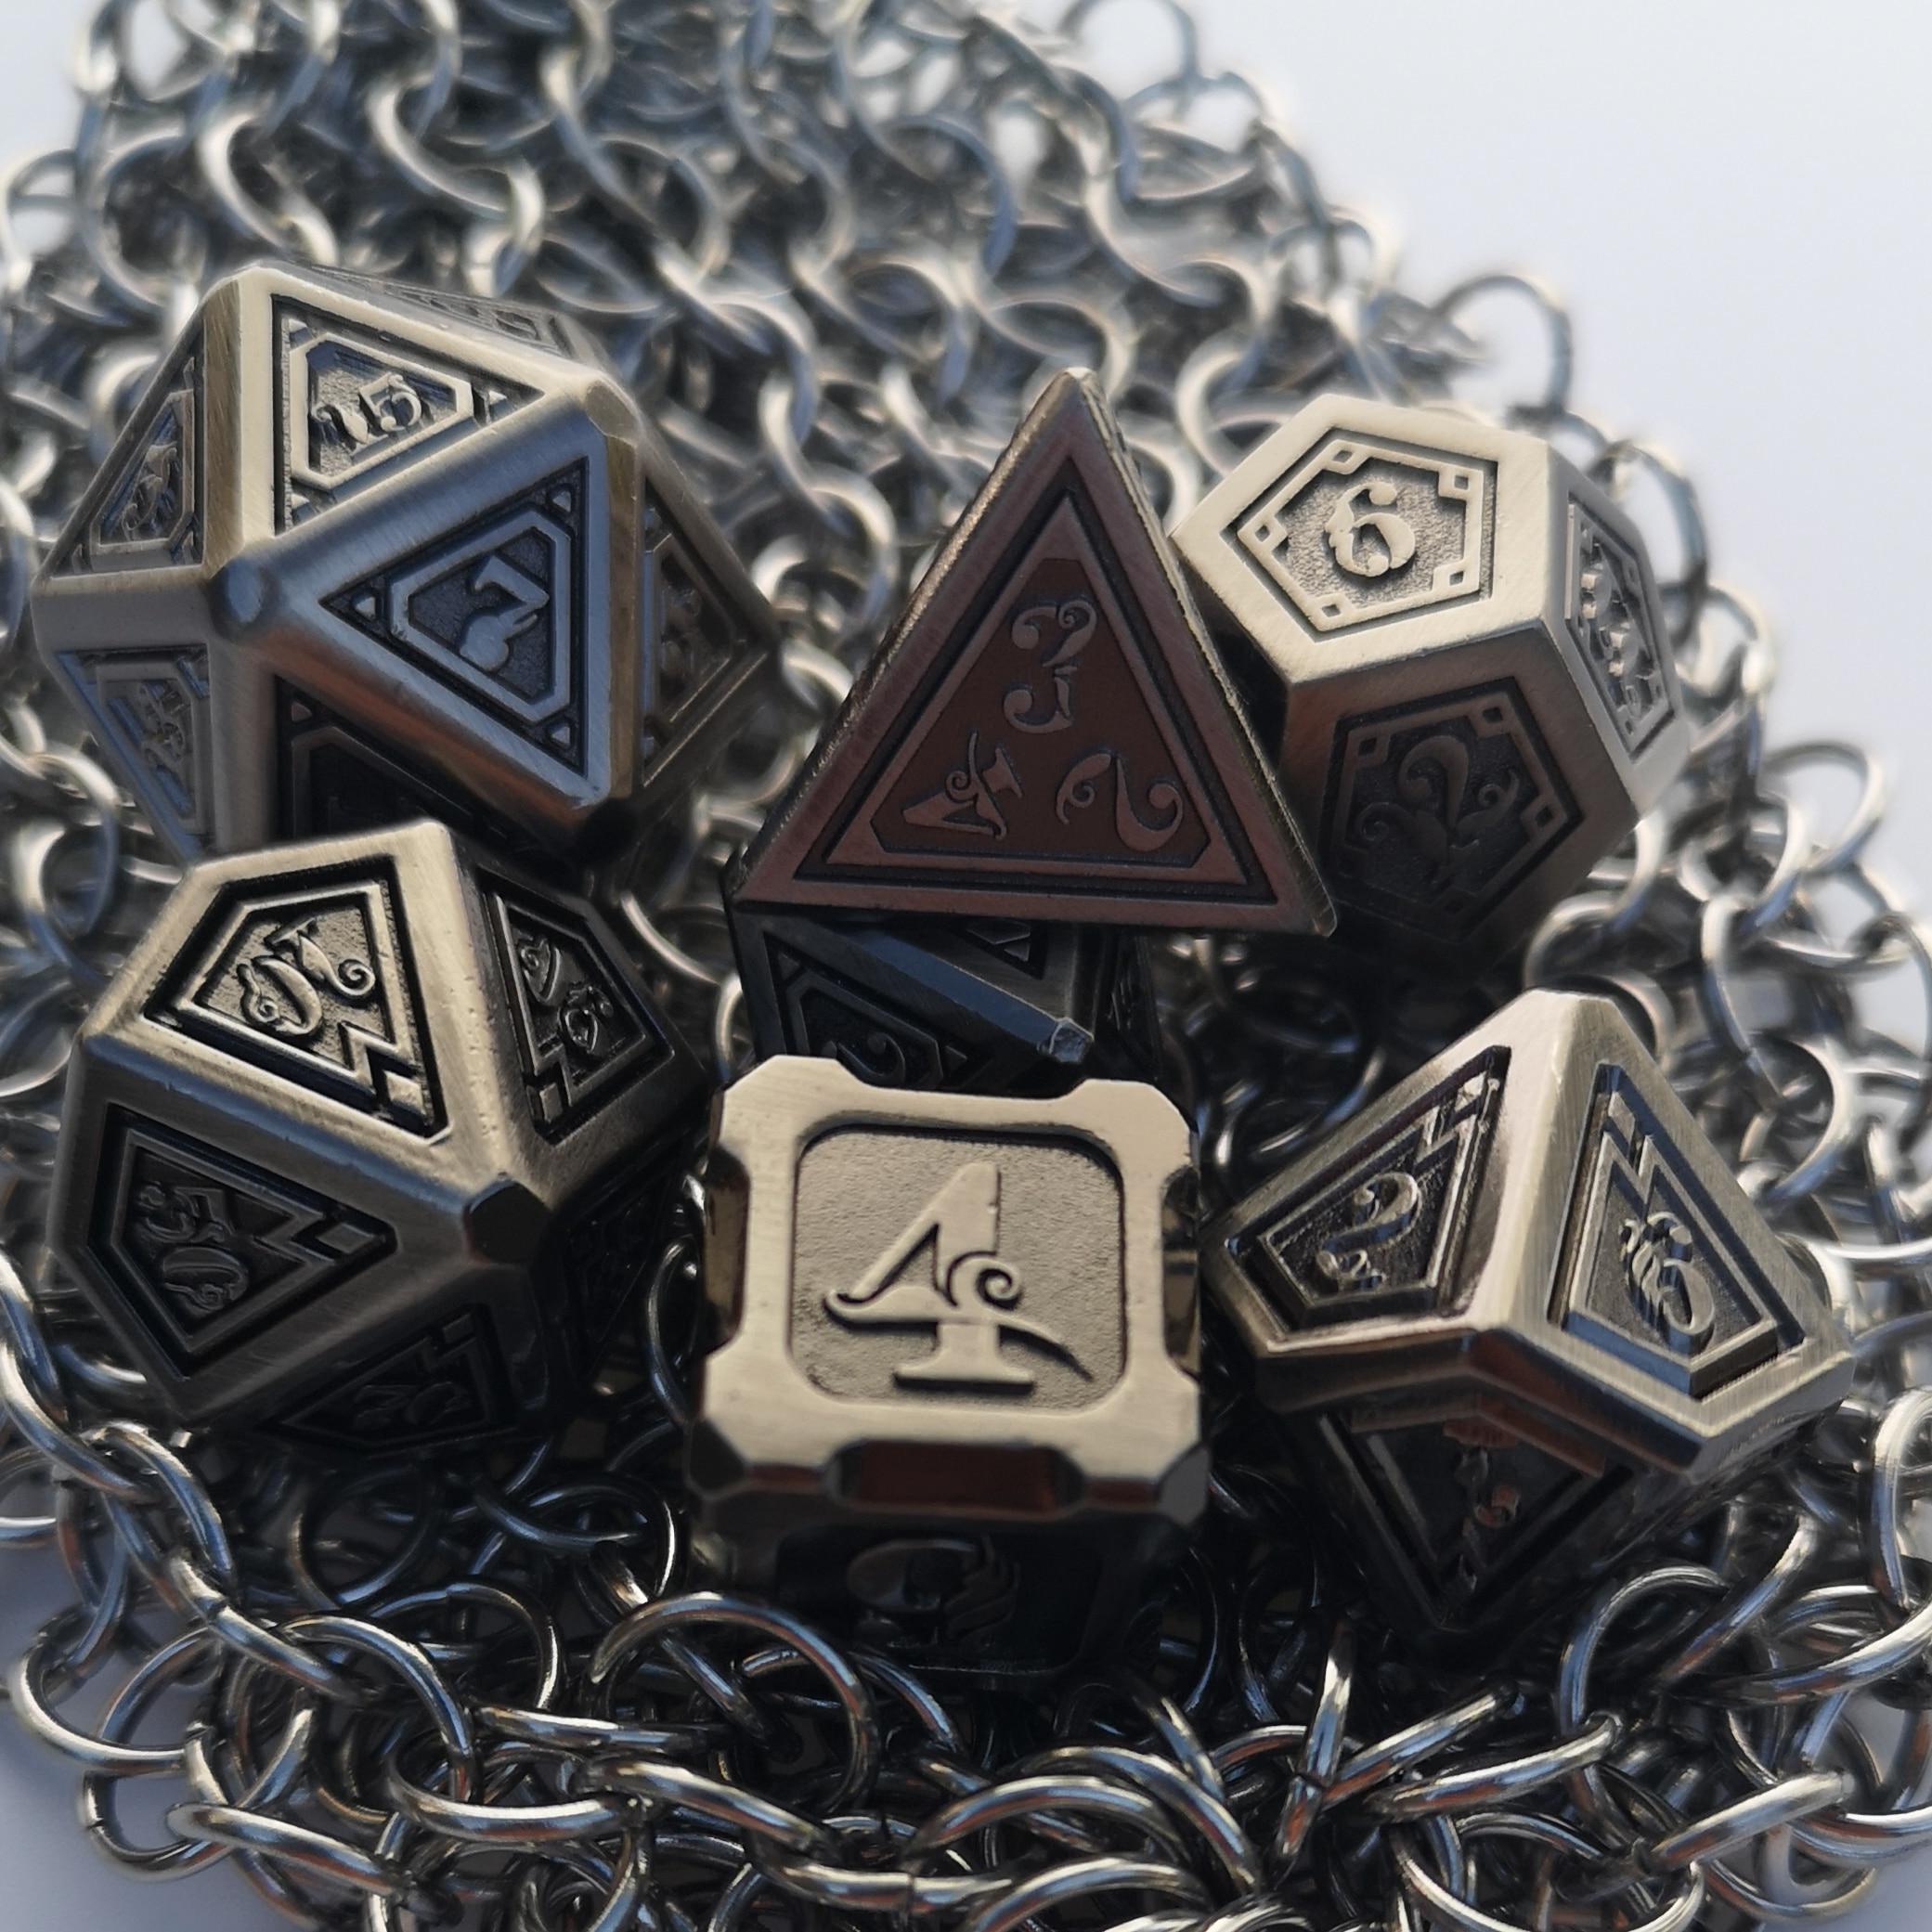 Rollooo DND Metal Dice Antique Copper 7-Die Set With Special Font D4 D6 D8 D10 D% D12 D20 For Role Playing Games